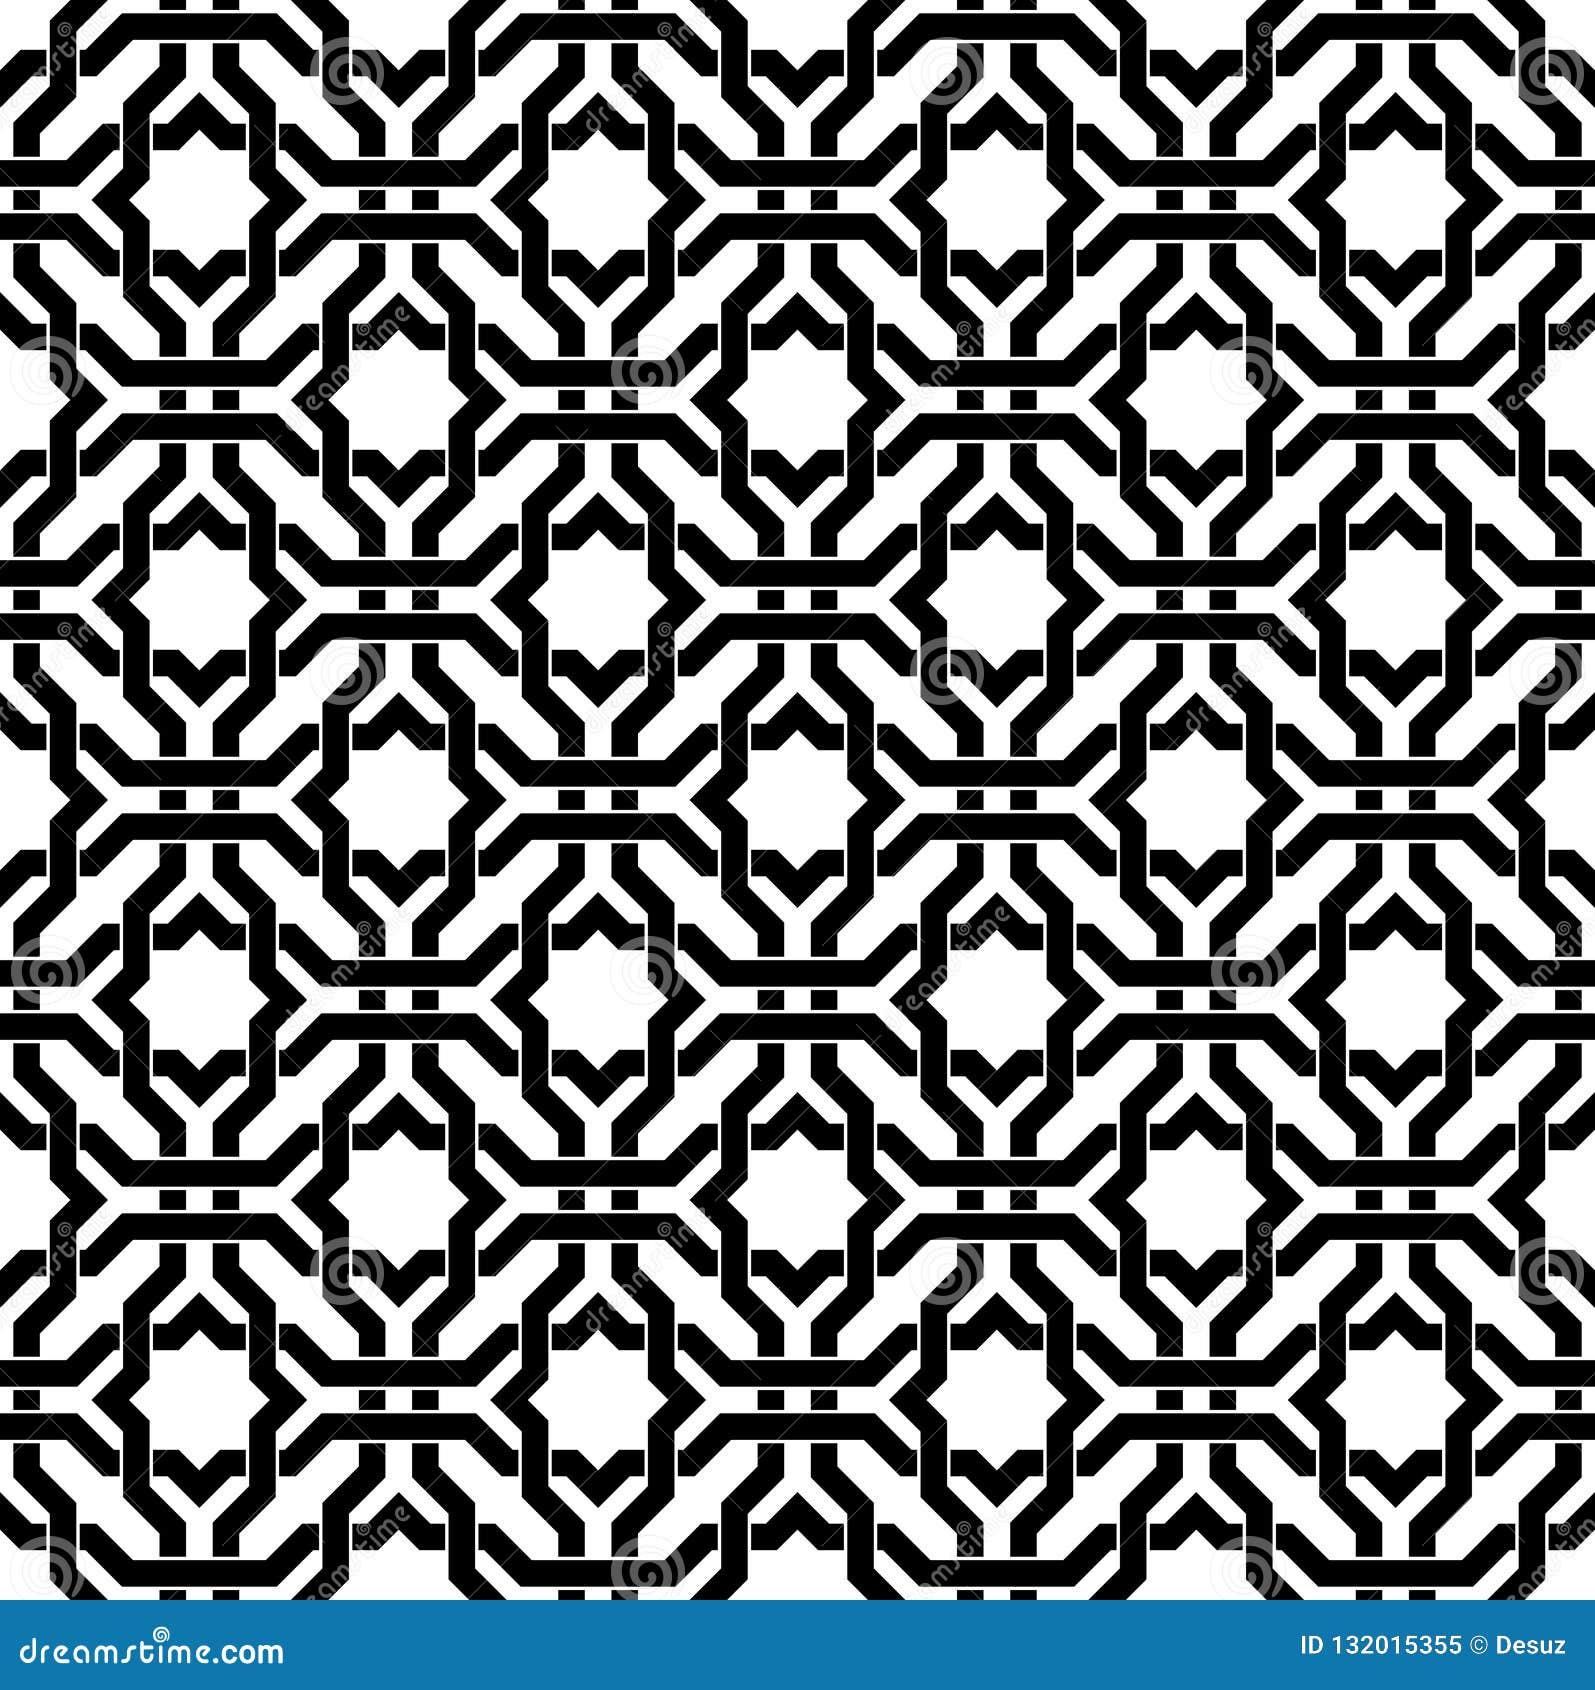 Black And White Arabic Geometric Seamless Pattern, Vector